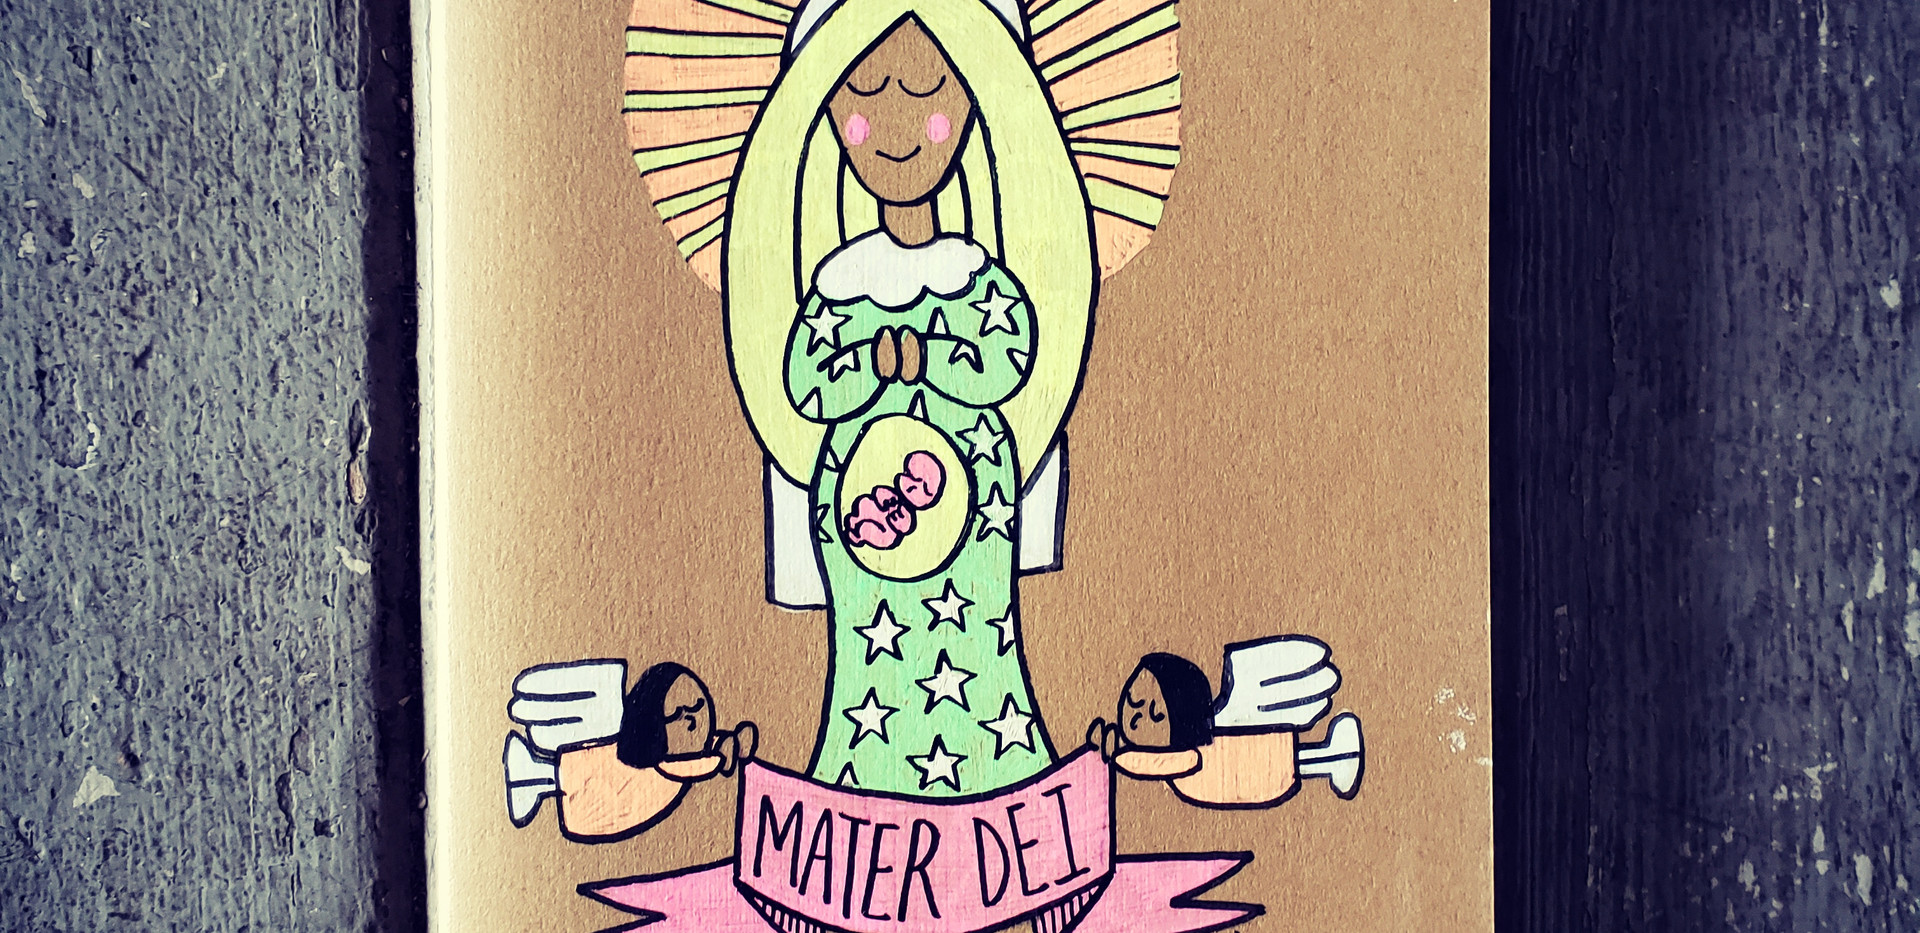 Mater Dei (Mother of God)